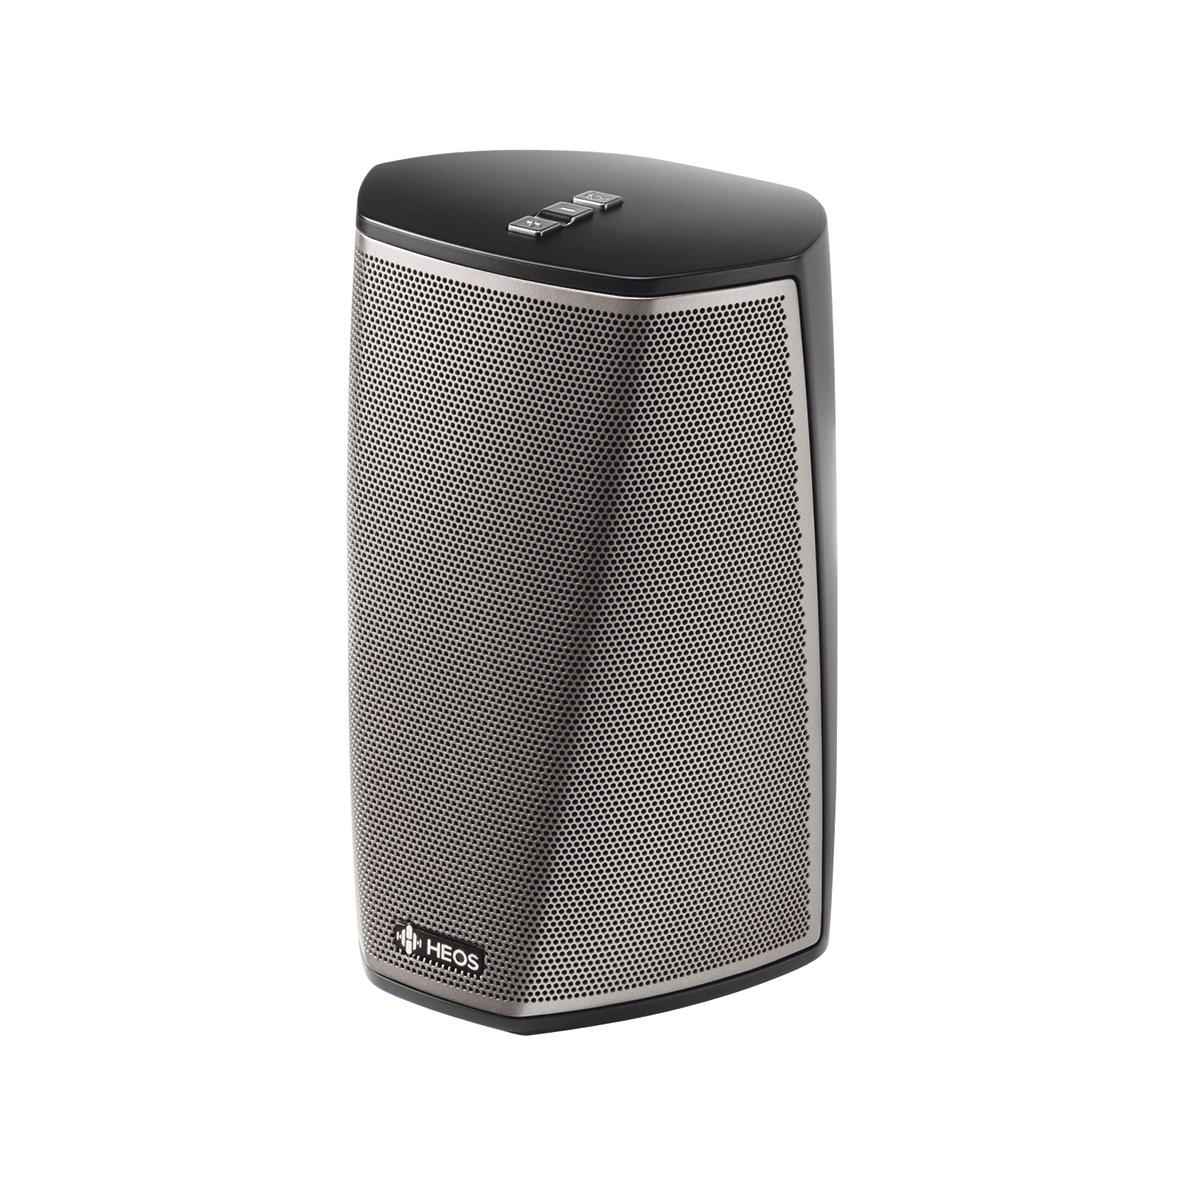 Image of DENON HEOS 1 Draadloze Speaker - Zwart